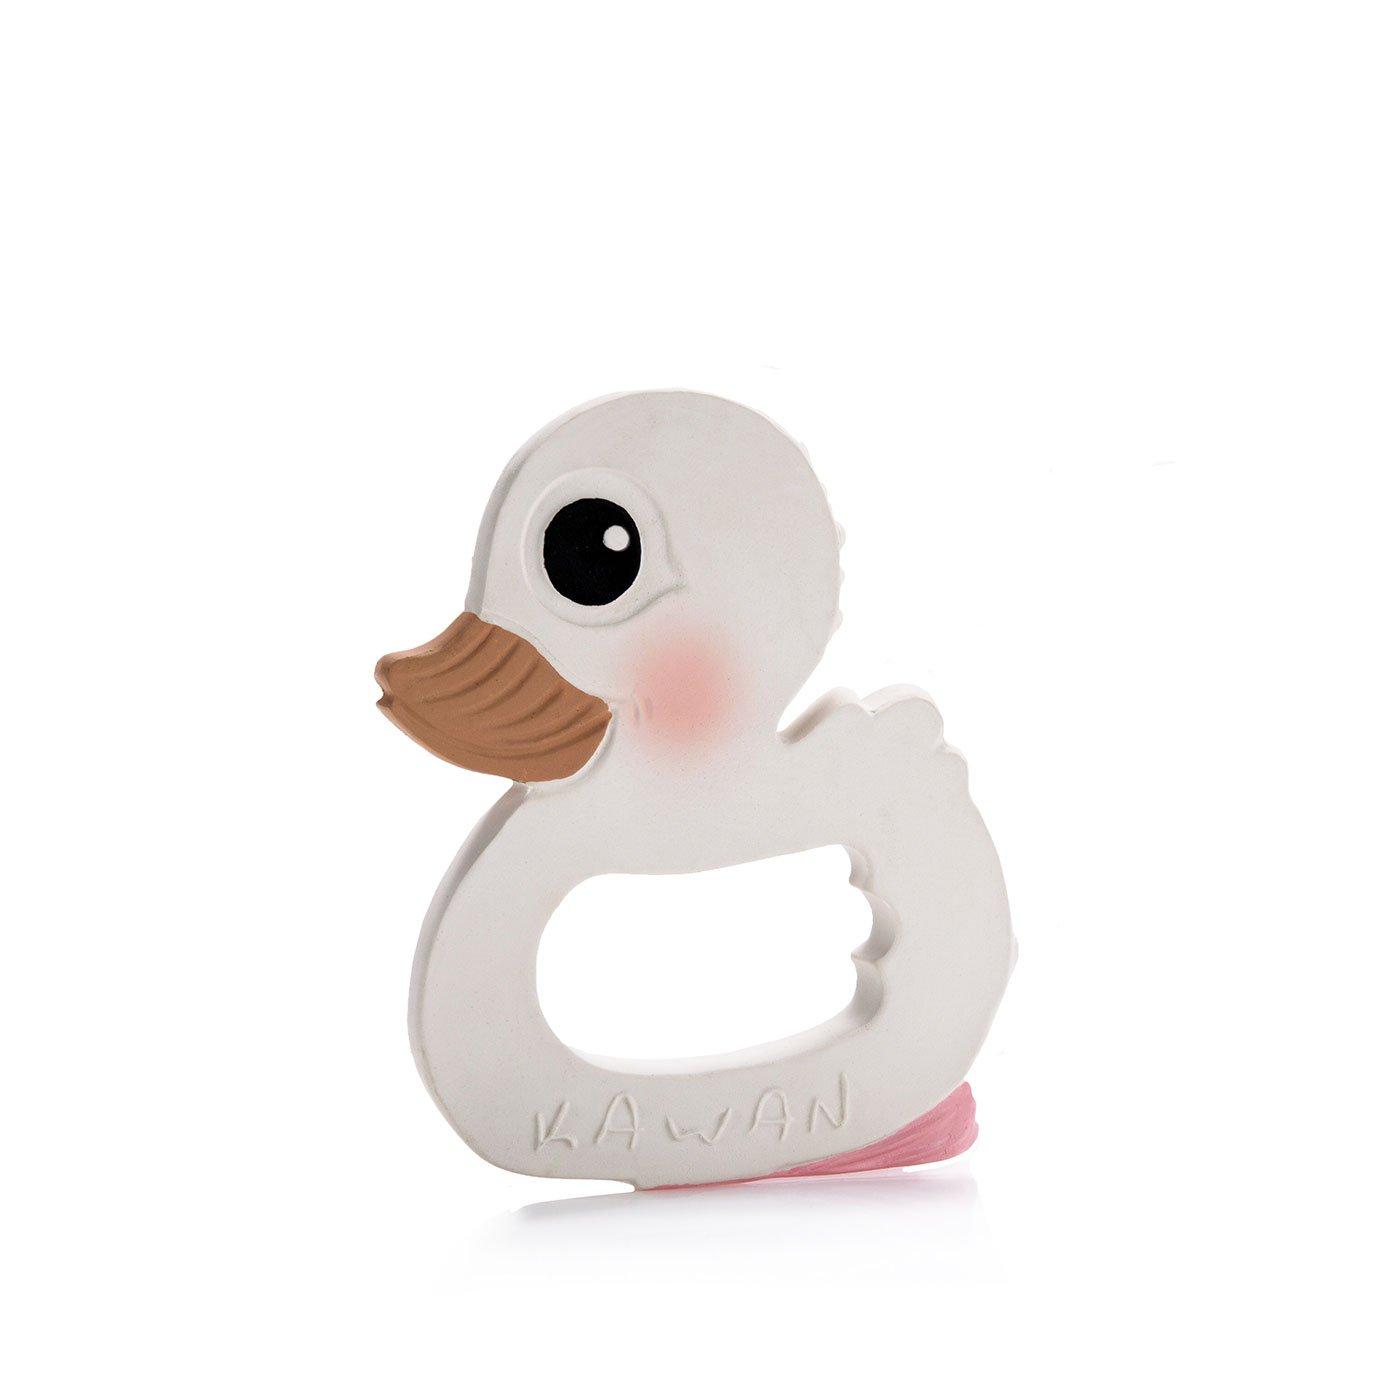 HEVEA Beißring aus Naturkautschuk Ente Kawan 553173